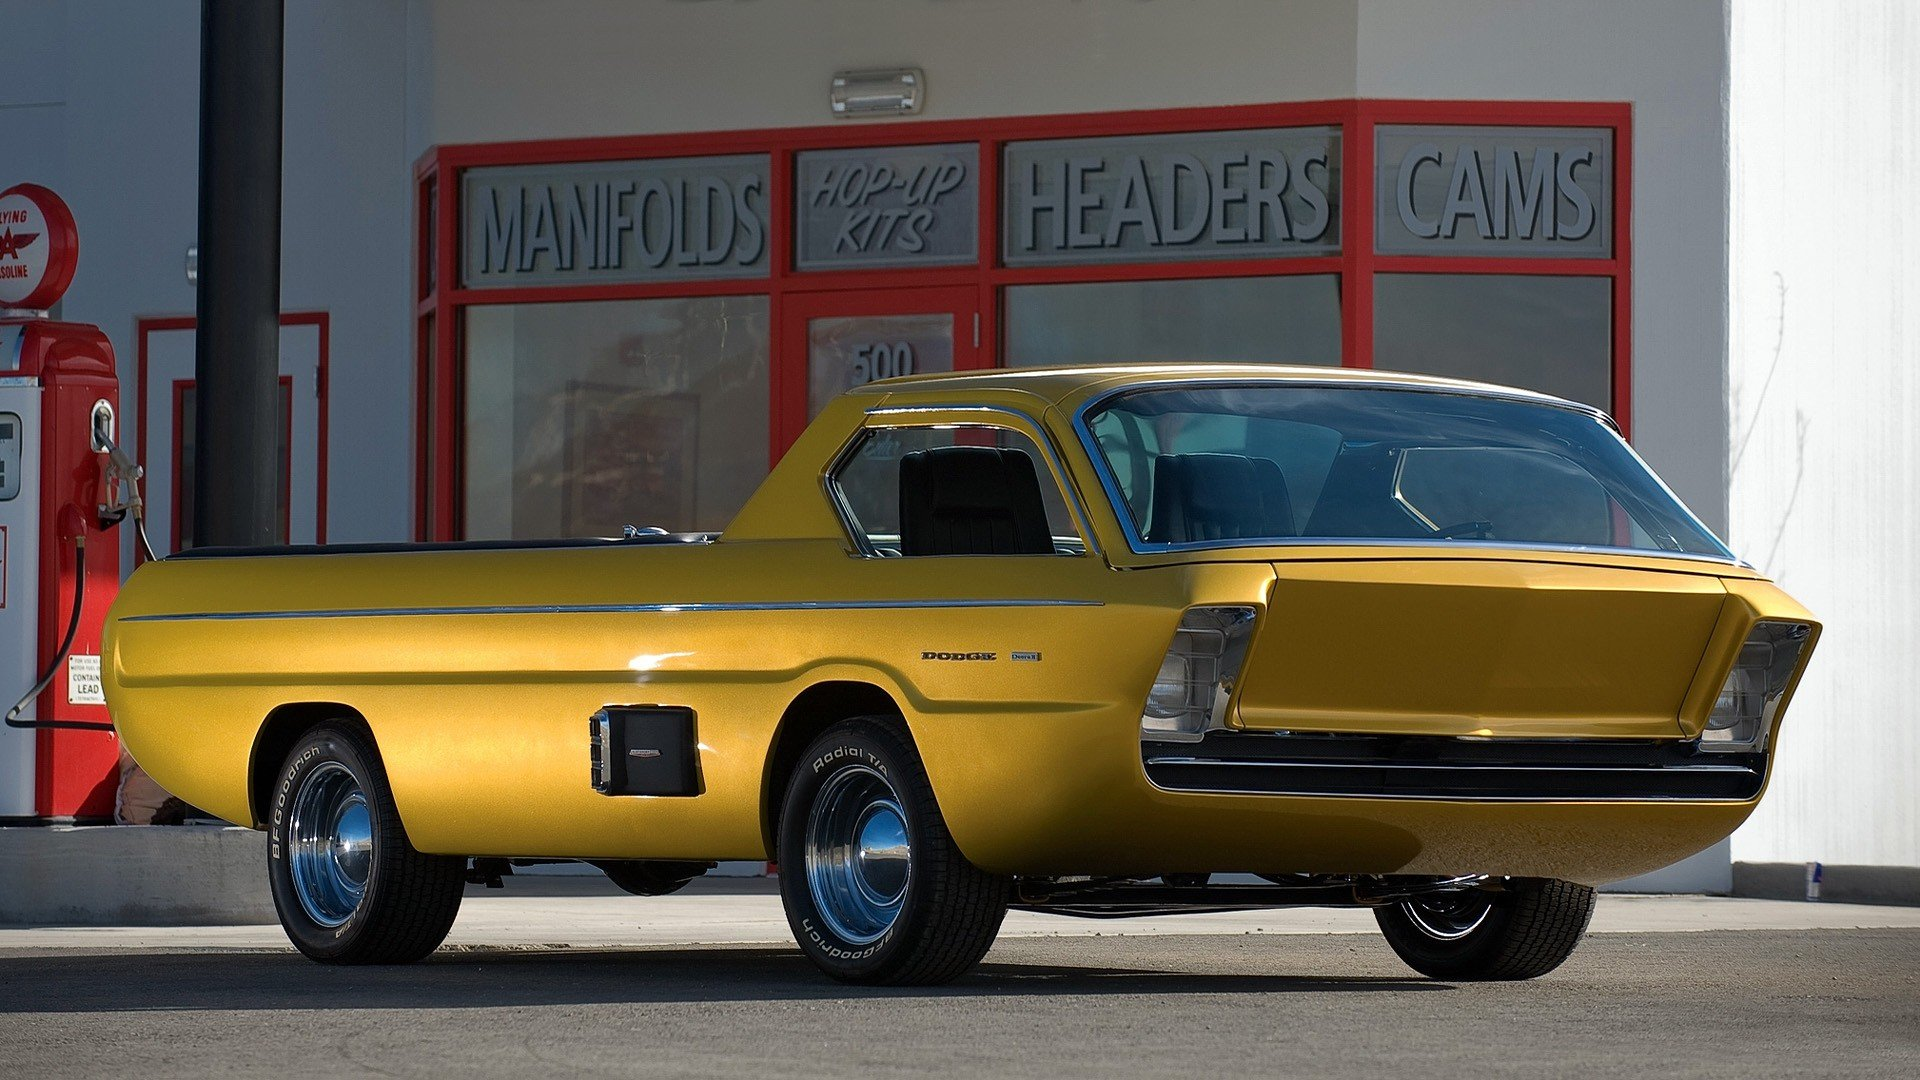 vintage cars pick up trucks dodge vehicles classic cars. Black Bedroom Furniture Sets. Home Design Ideas